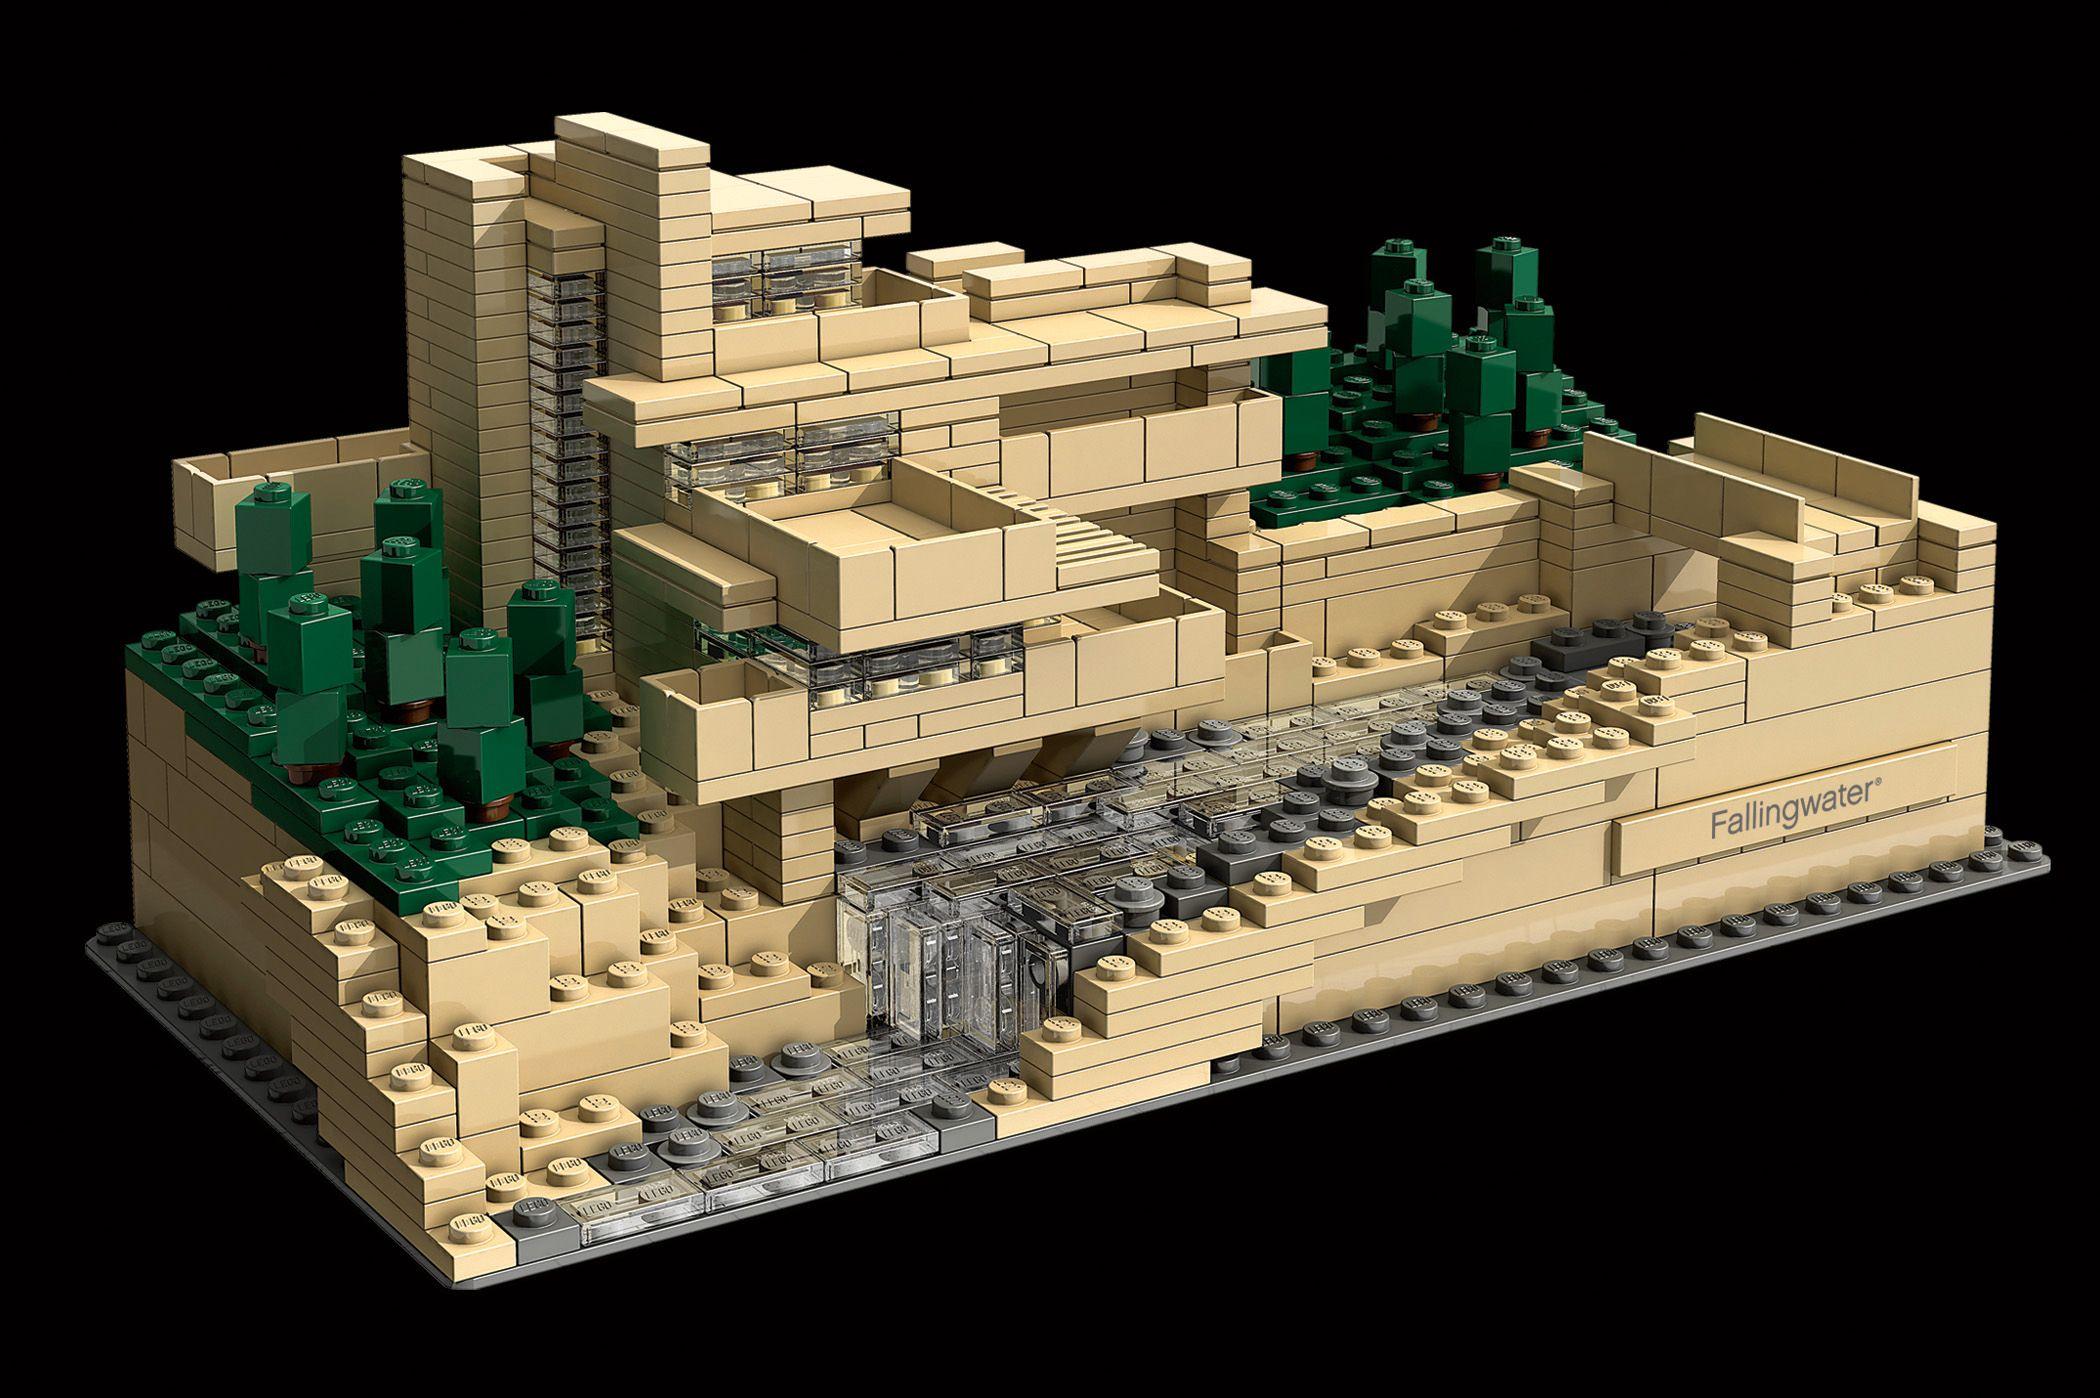 Lego Architecture Arquitectura de lego, Casa de la